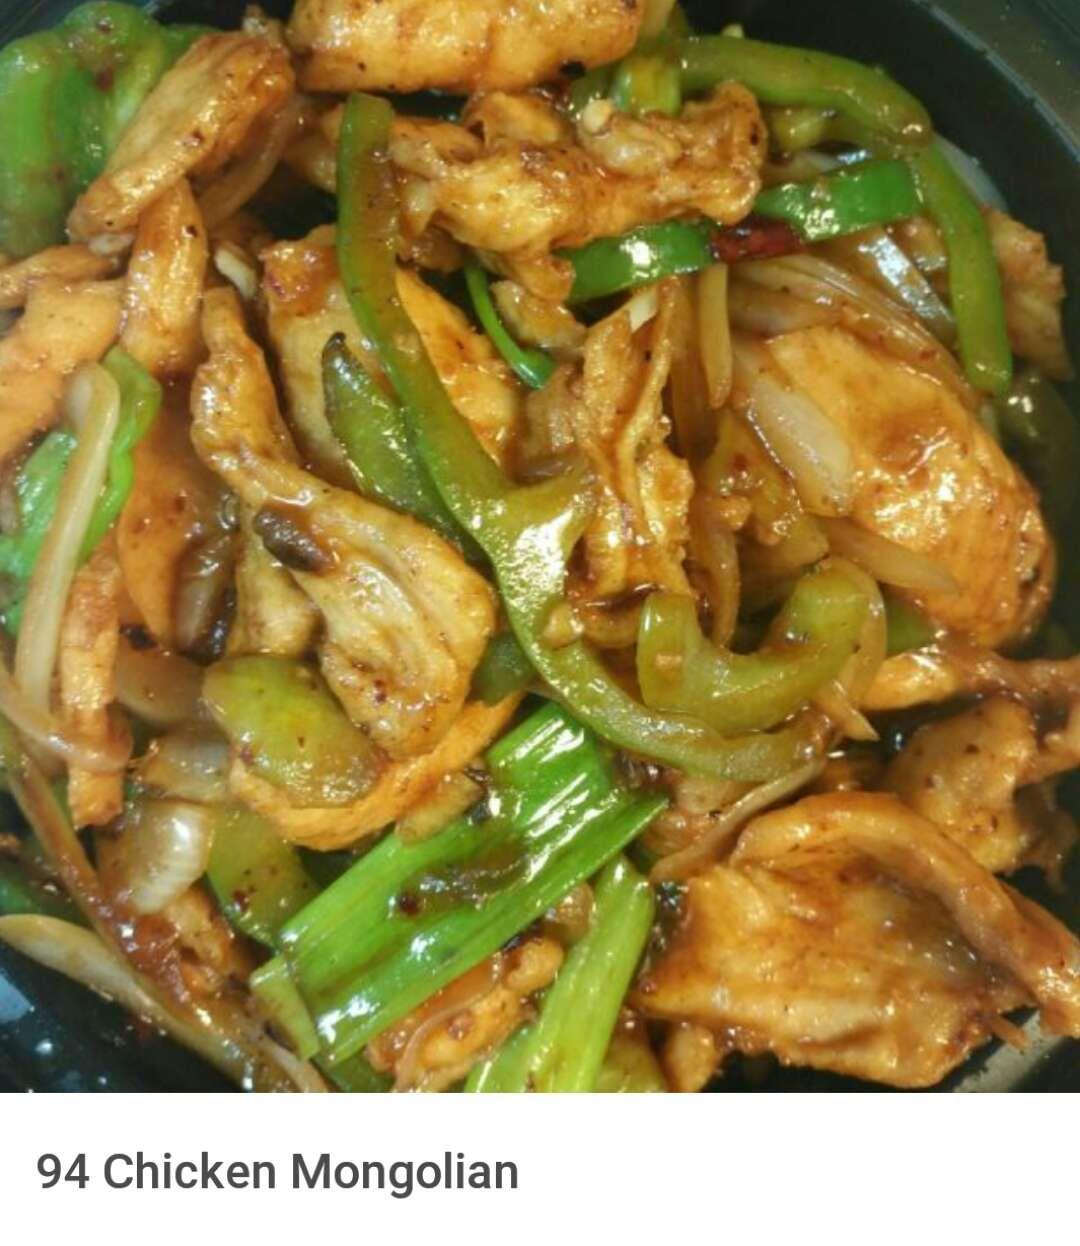 94. Chicken Mongolian Image